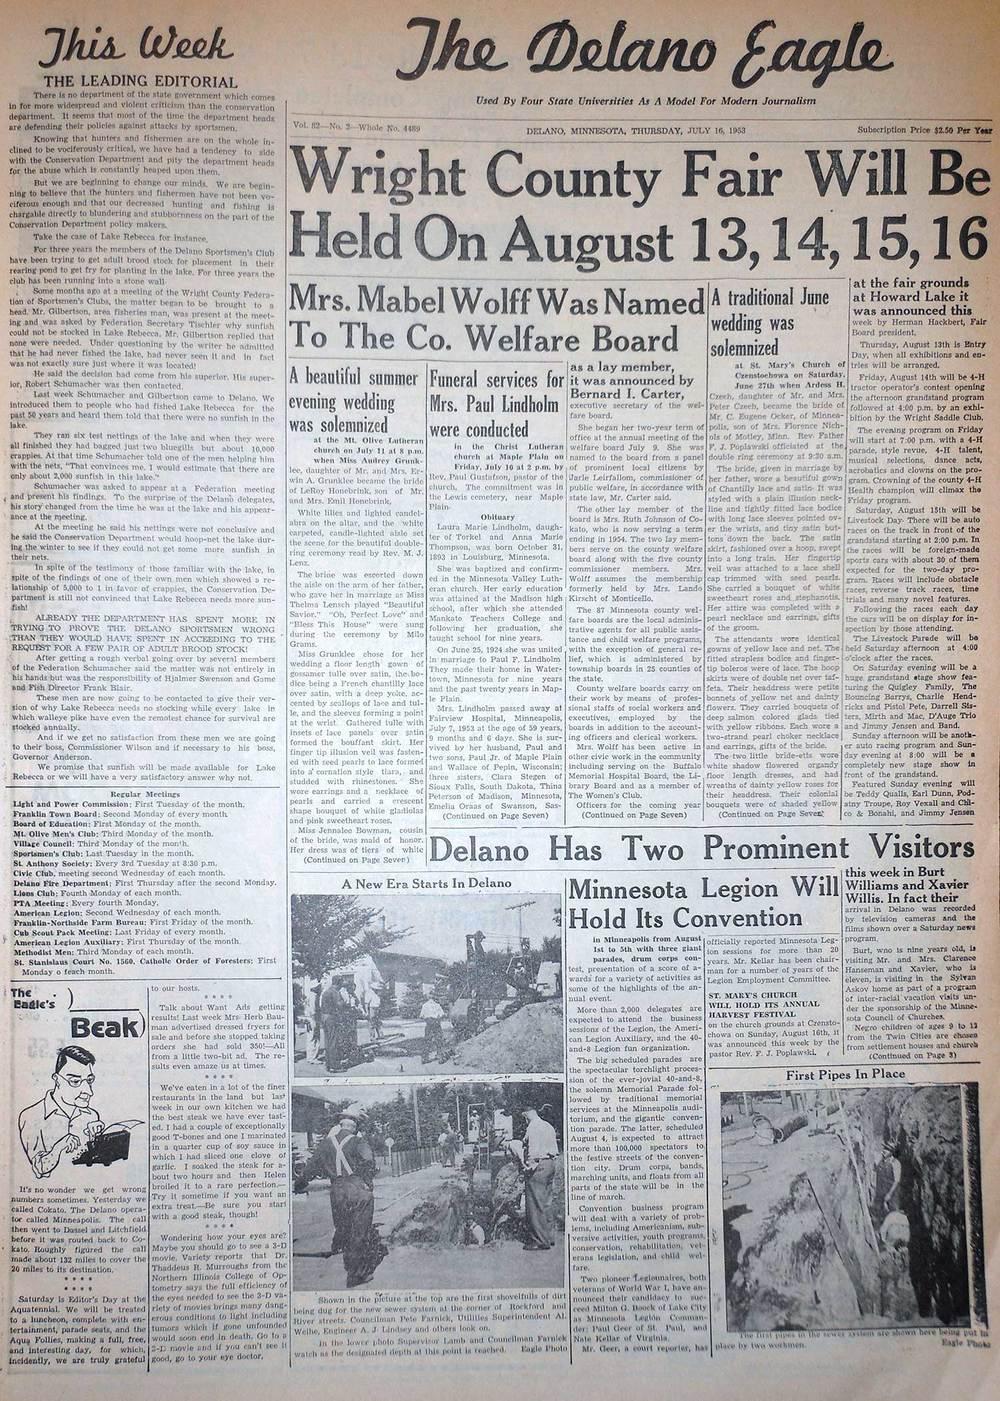 7/16/1953, p1